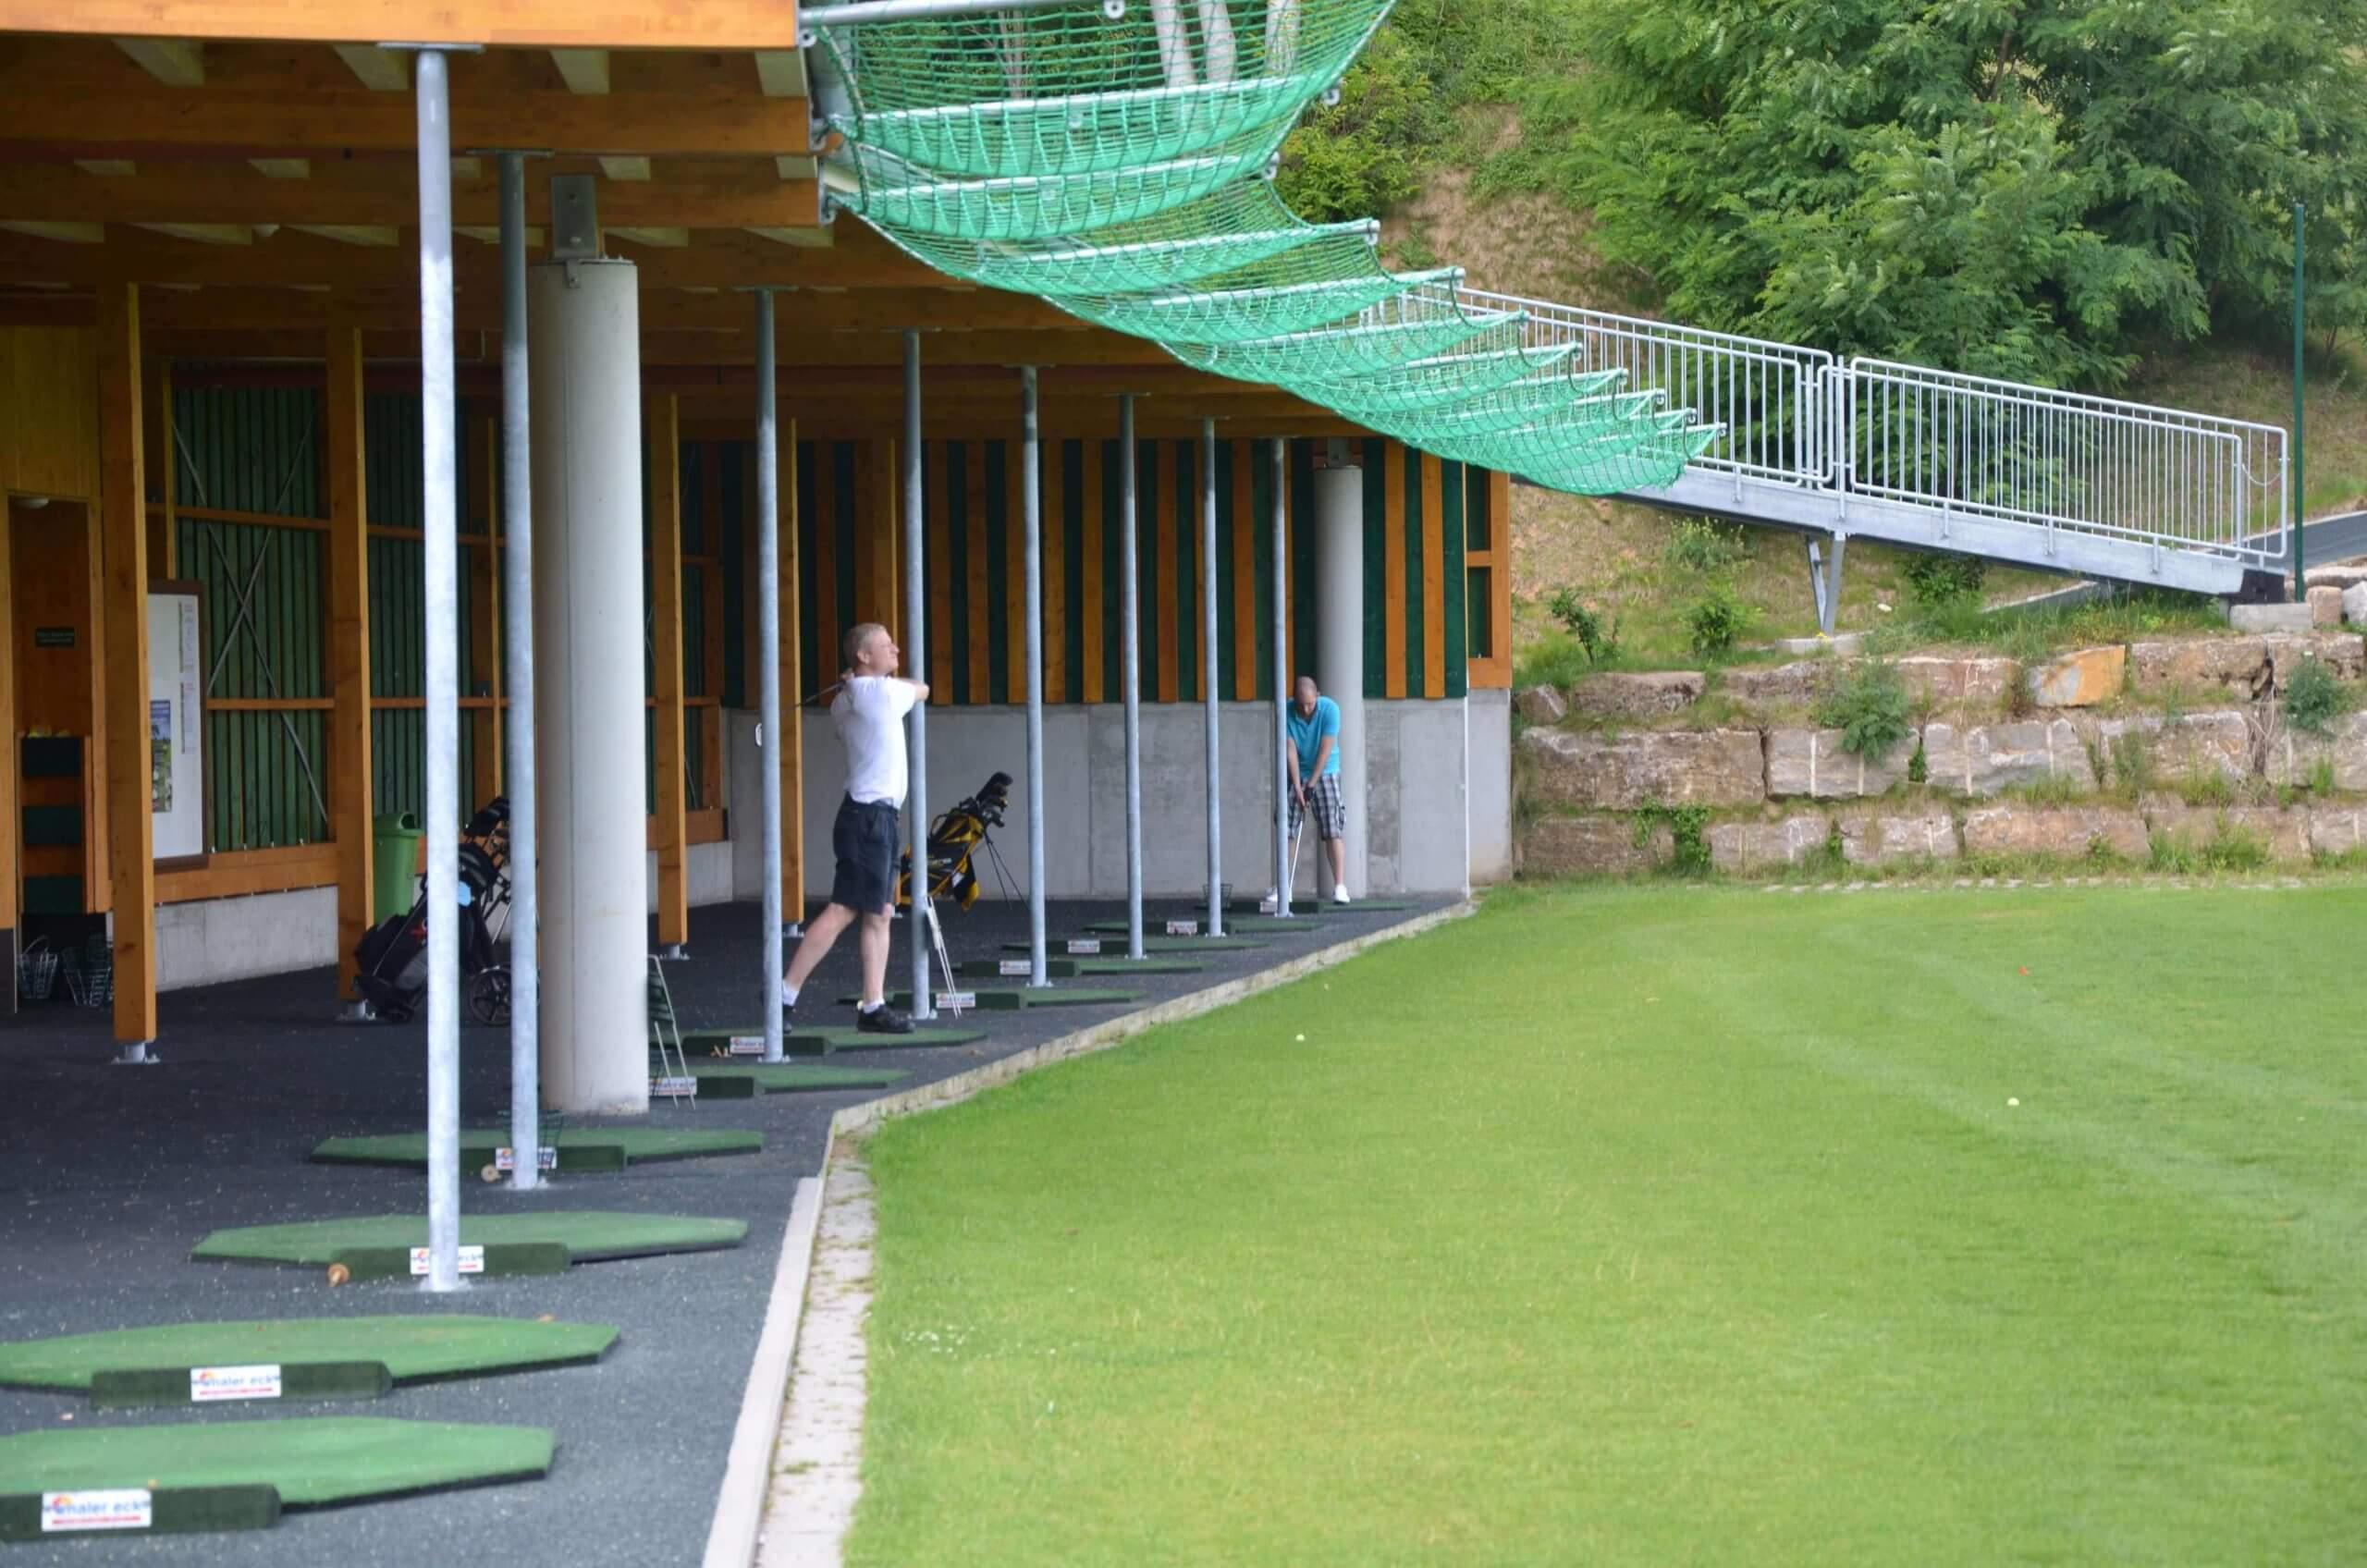 Offizielle DGV Golf Platzreife